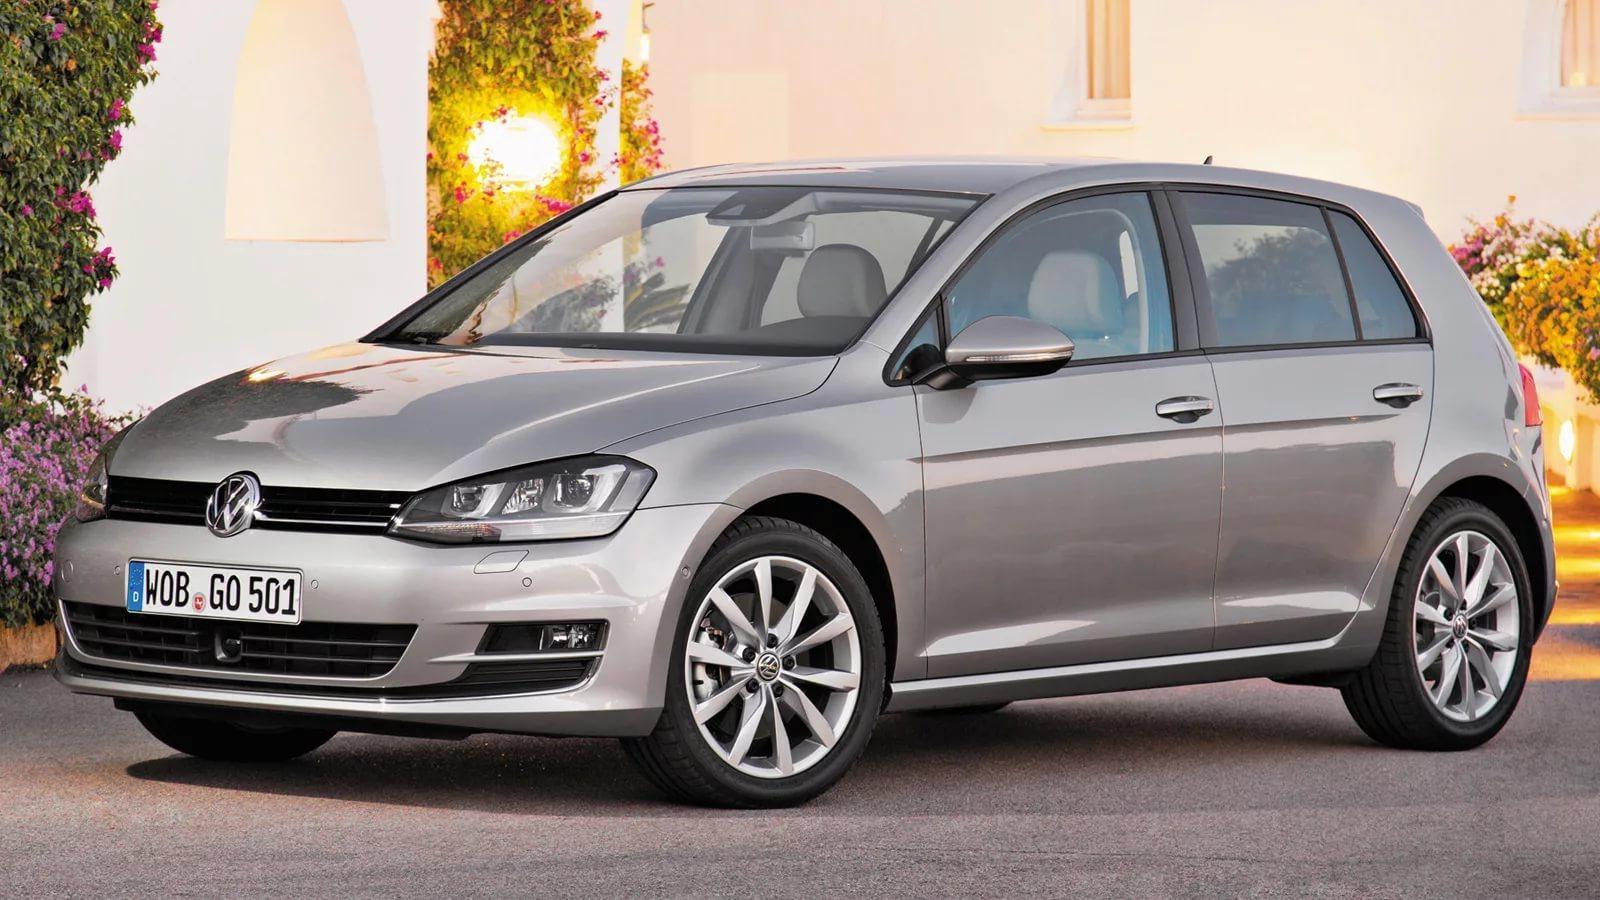 Volkswagen Golf седьмого поколения, sollogroup.ru